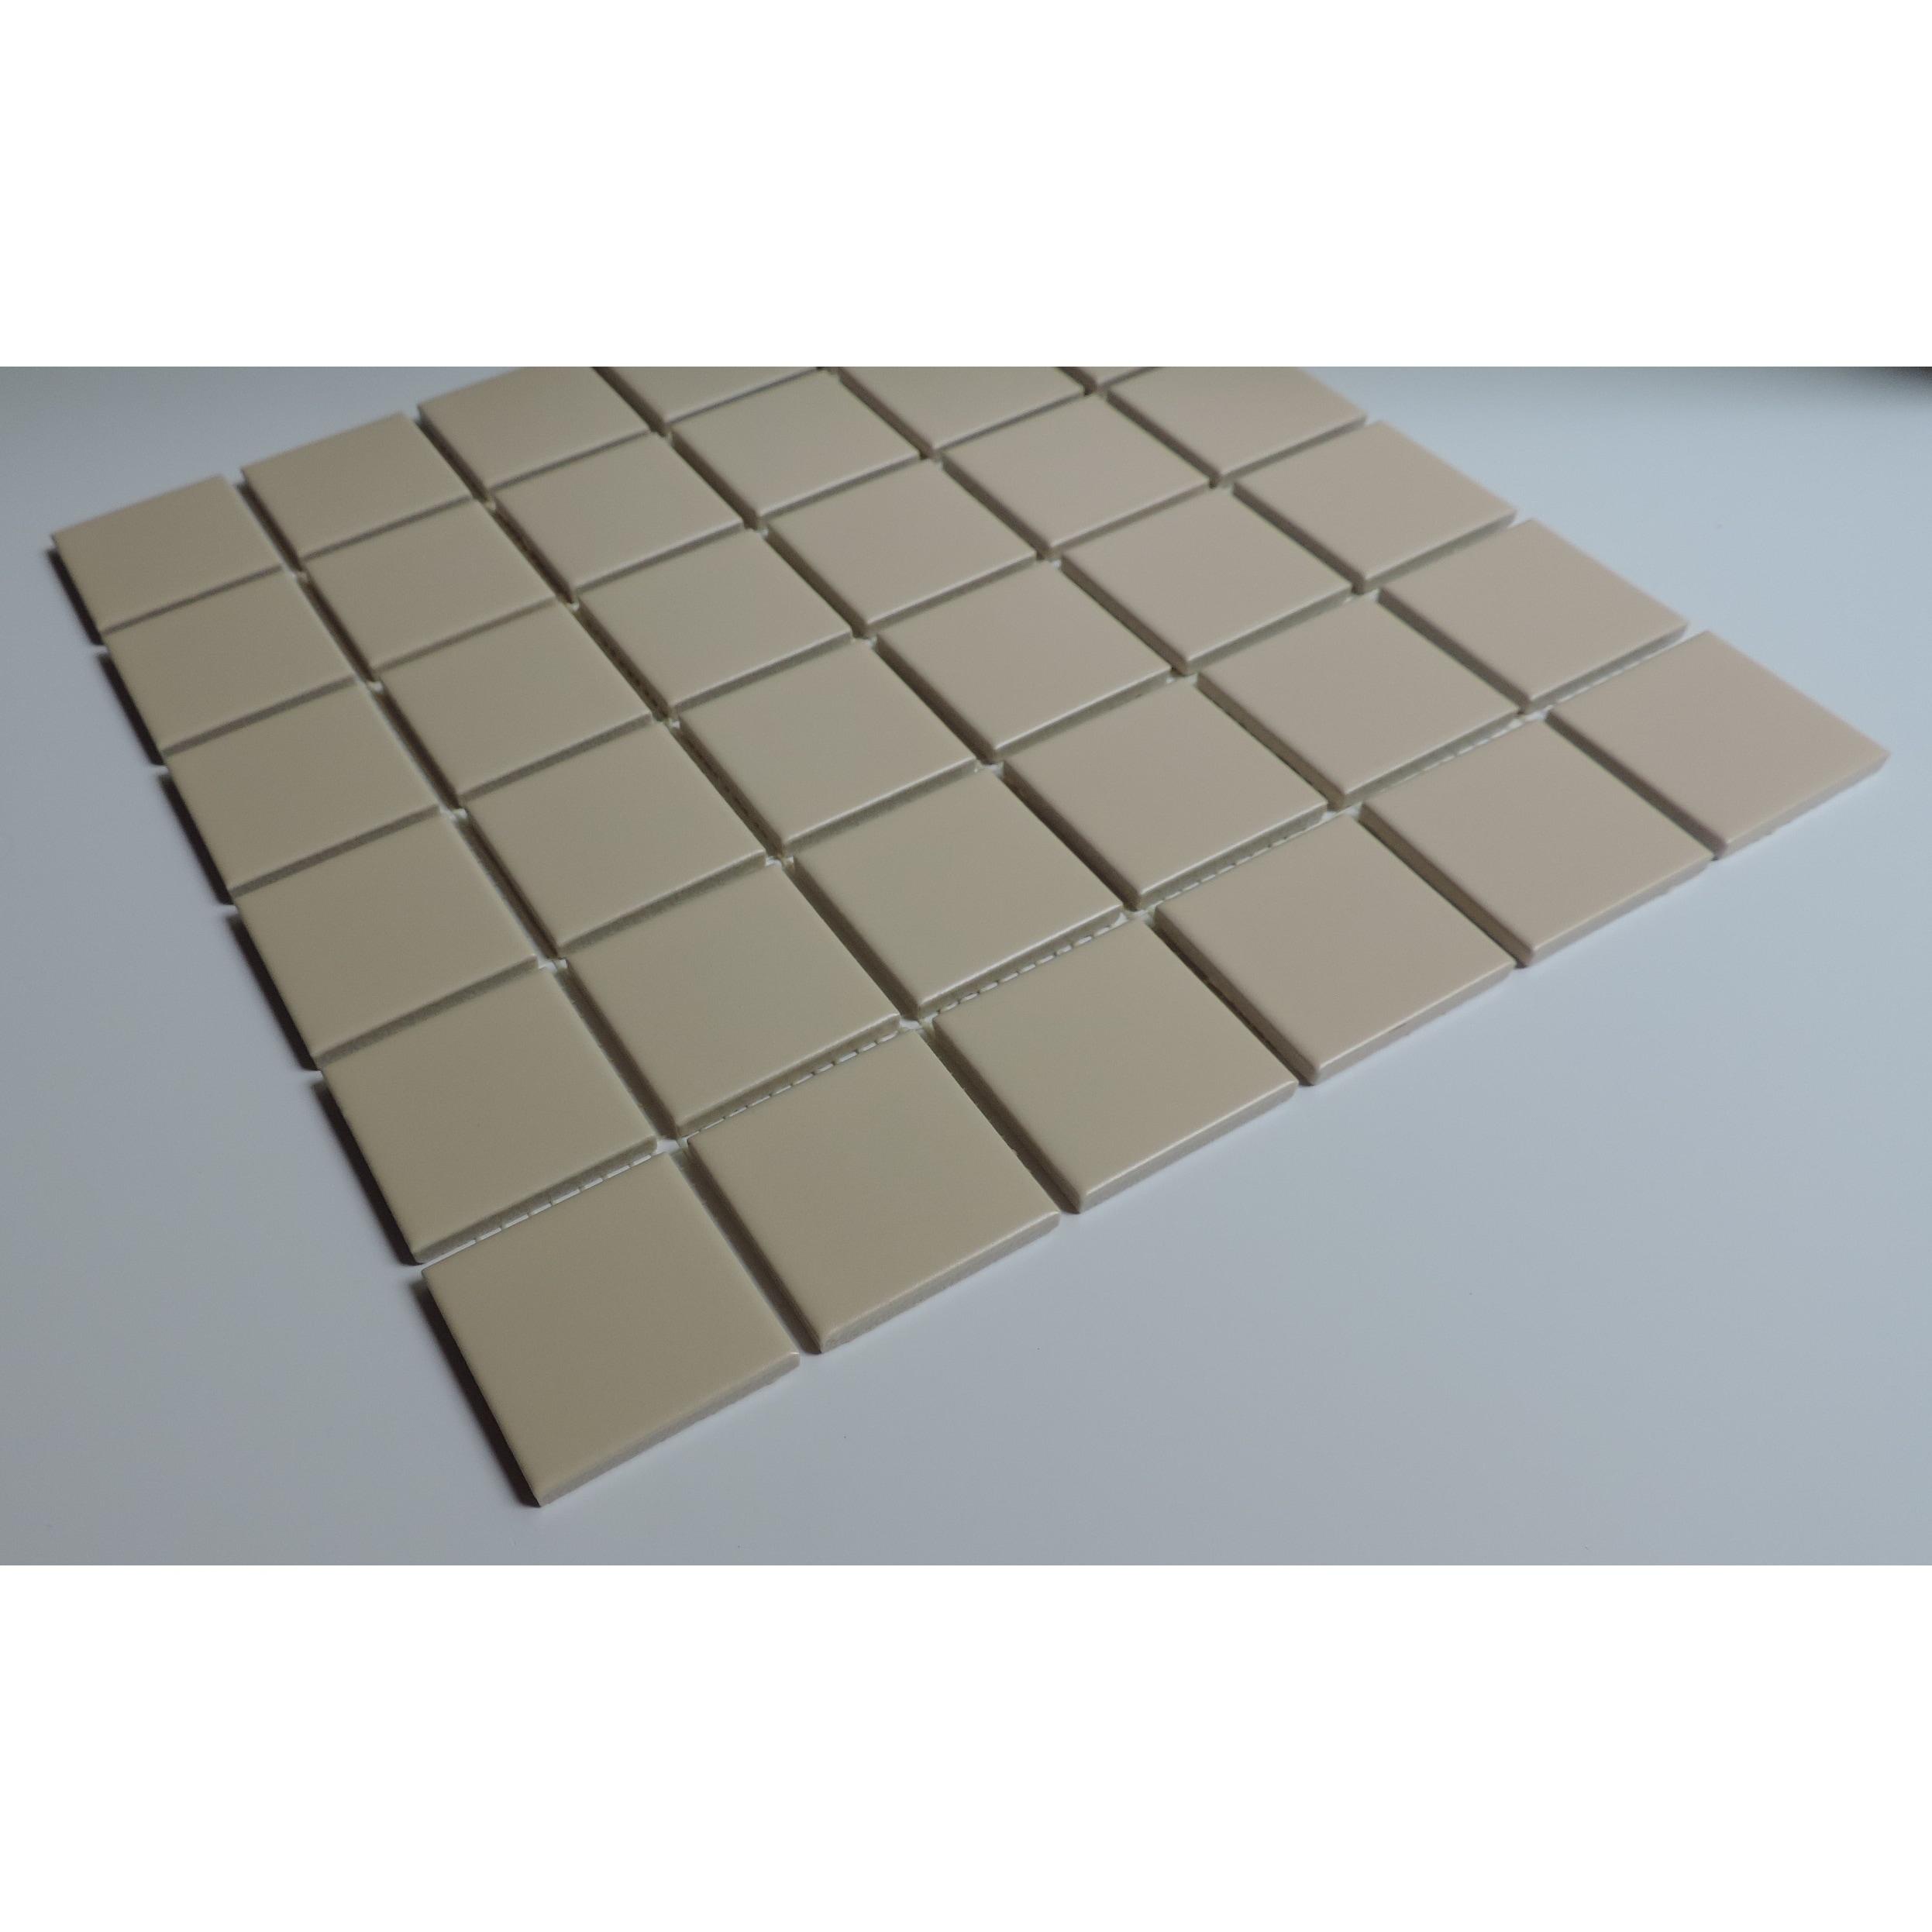 Glazed Porcelain Mosaic Tile Sheet Barcelona 2 X2 Square Matte Cream Overstock 28473448